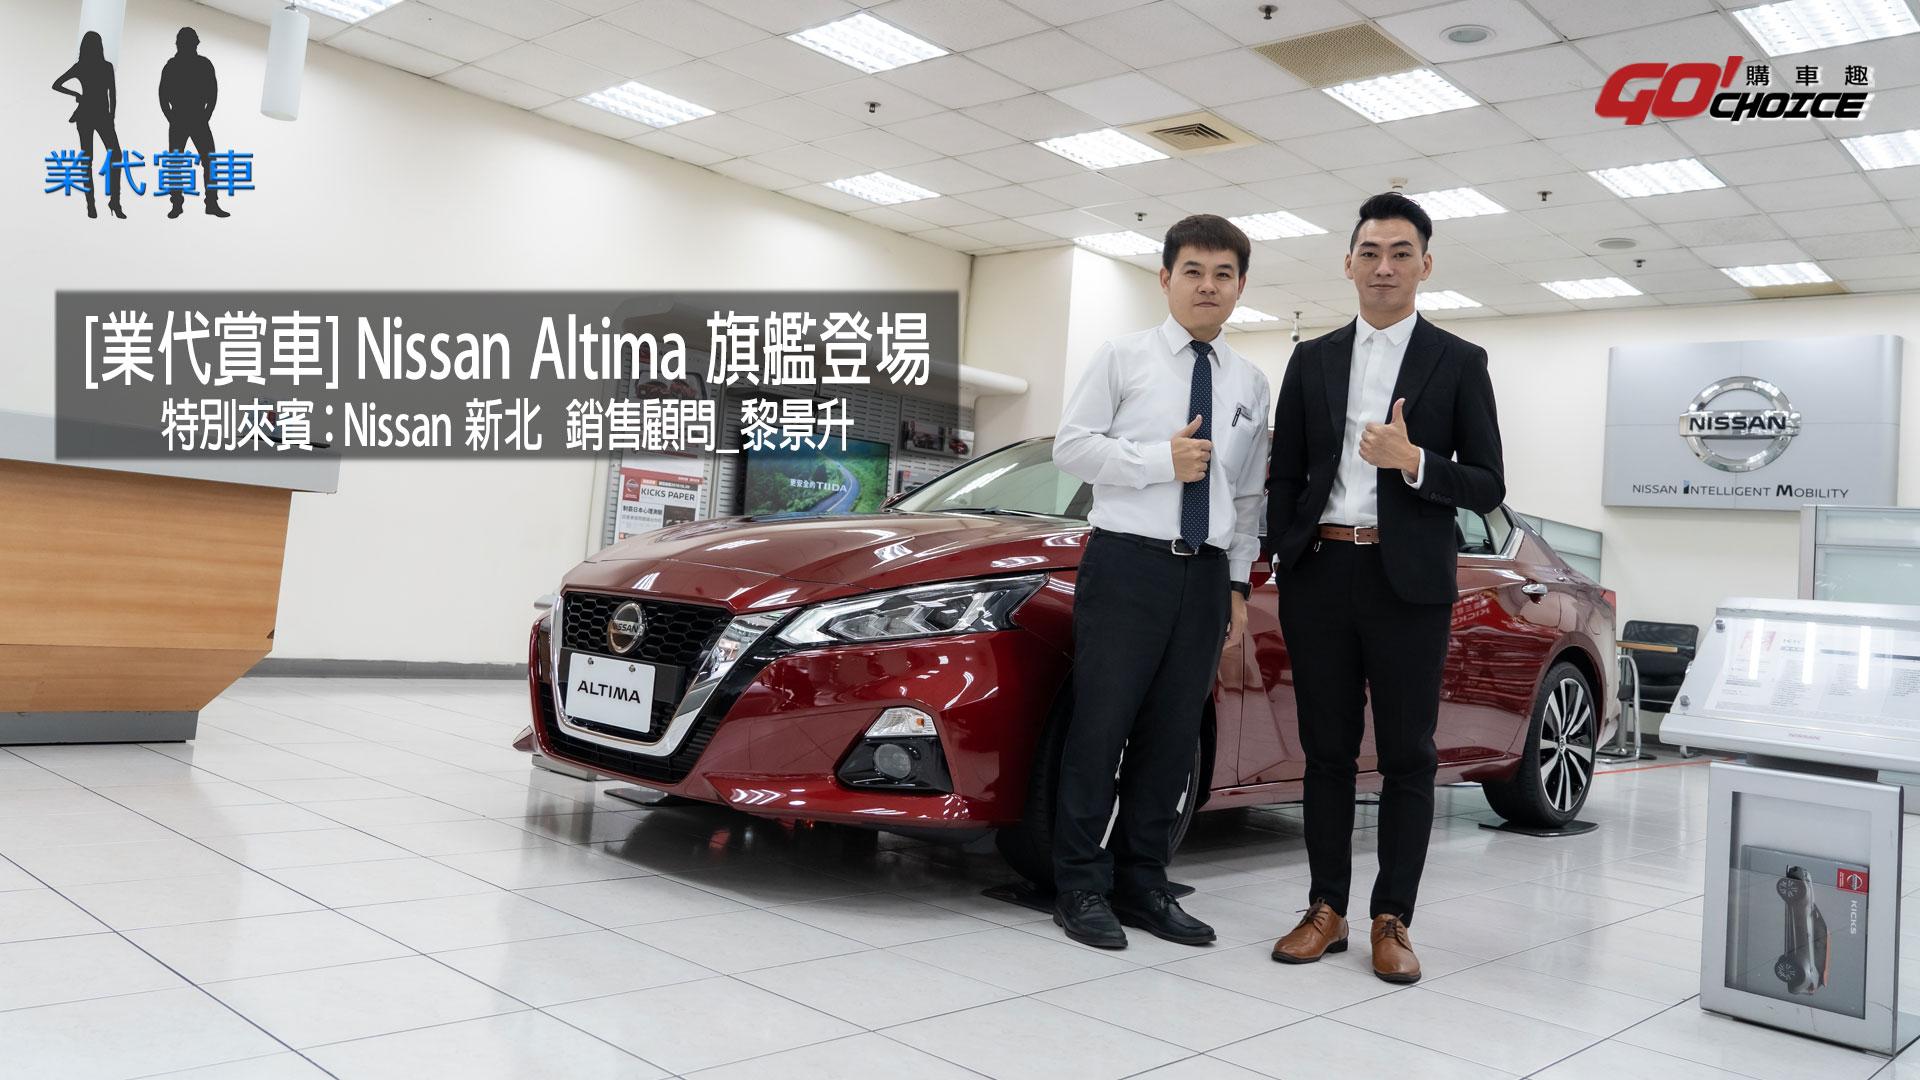 業代賞車-Nissan Altima-Nissan銷售顧問_黎景升